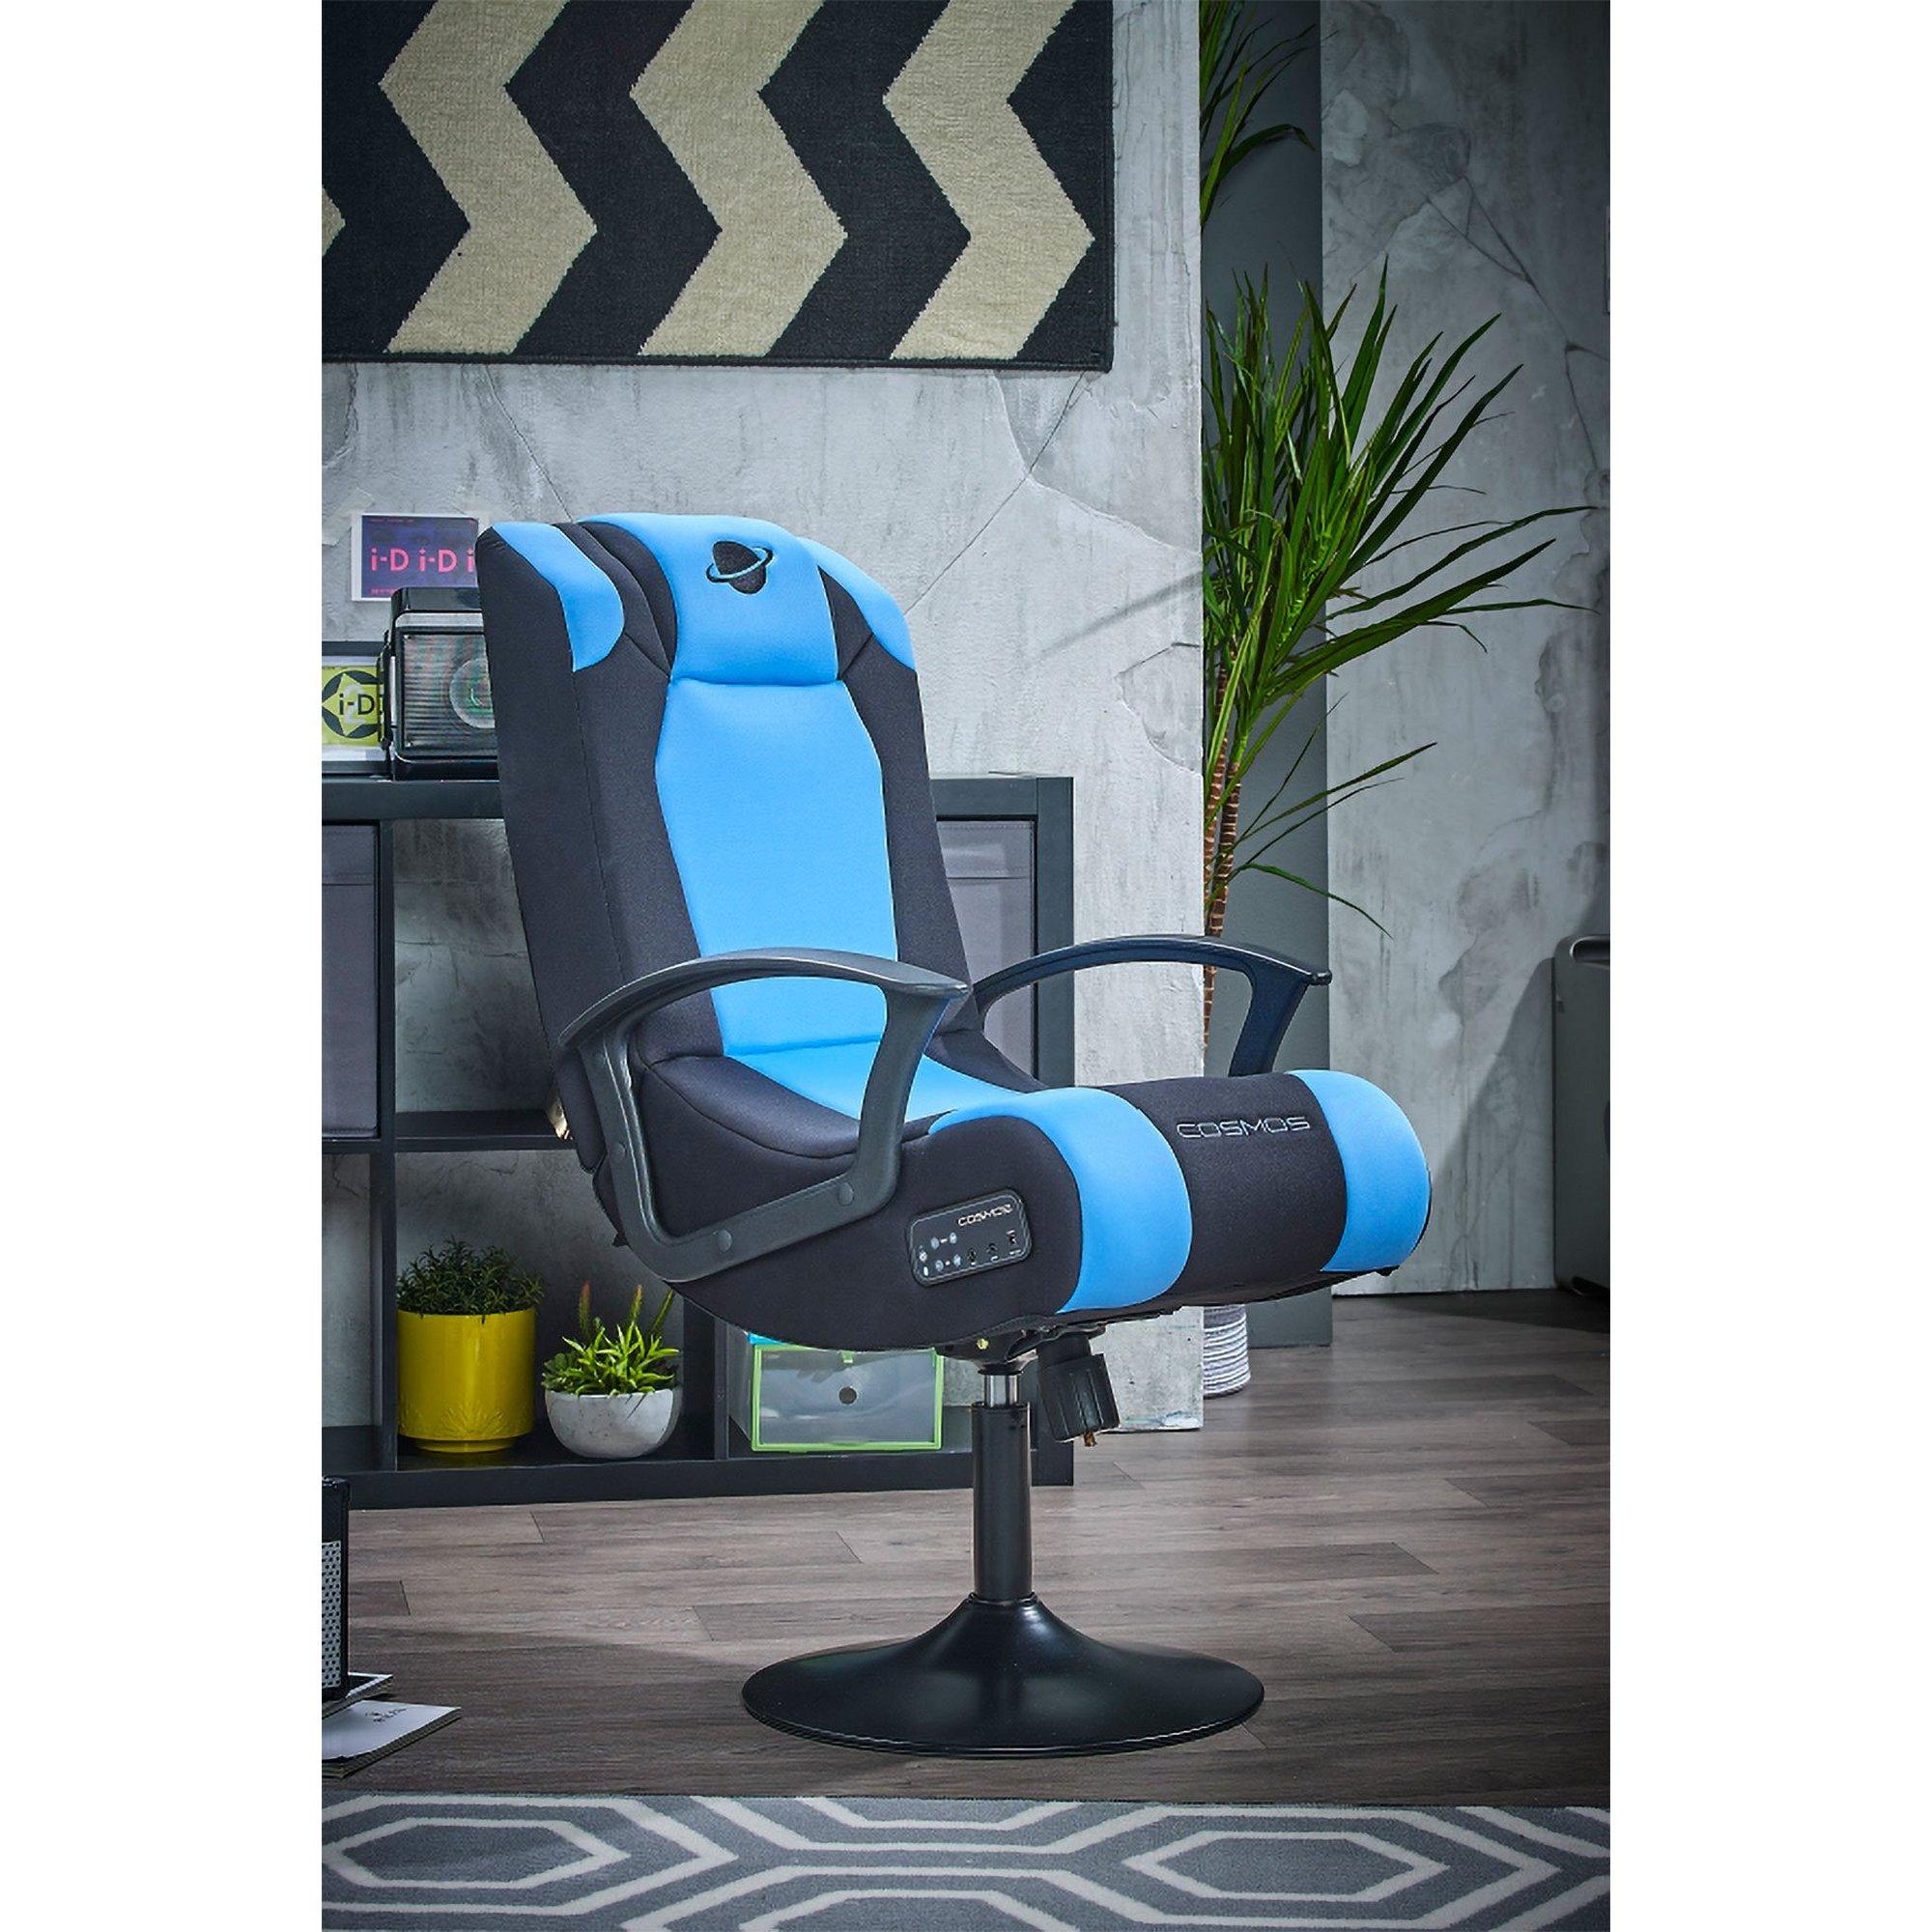 Image of Cosmos 2.1 Titan Pedestal Gaming Chair